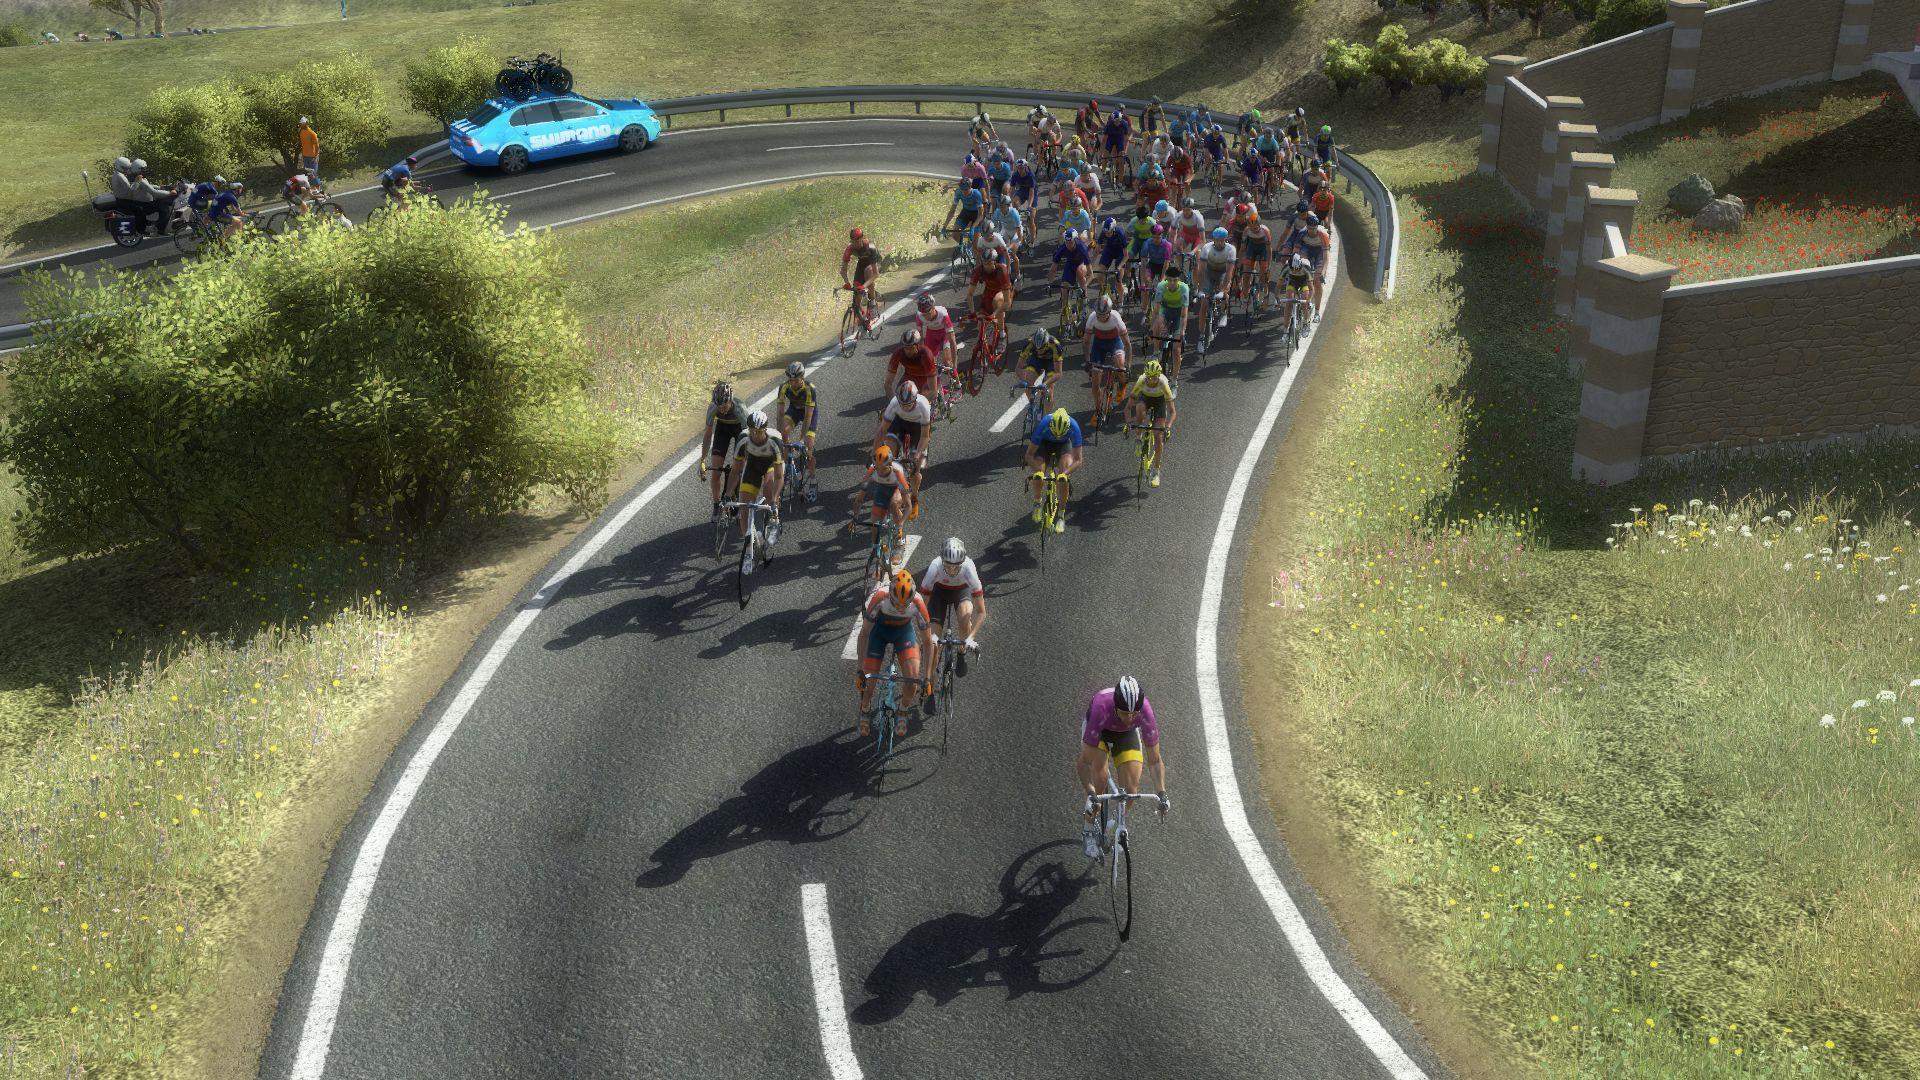 pcmdaily.com/images/mg/2020/Reports/GTM/Giro/S09/mg20_giro_s09_47.jpg